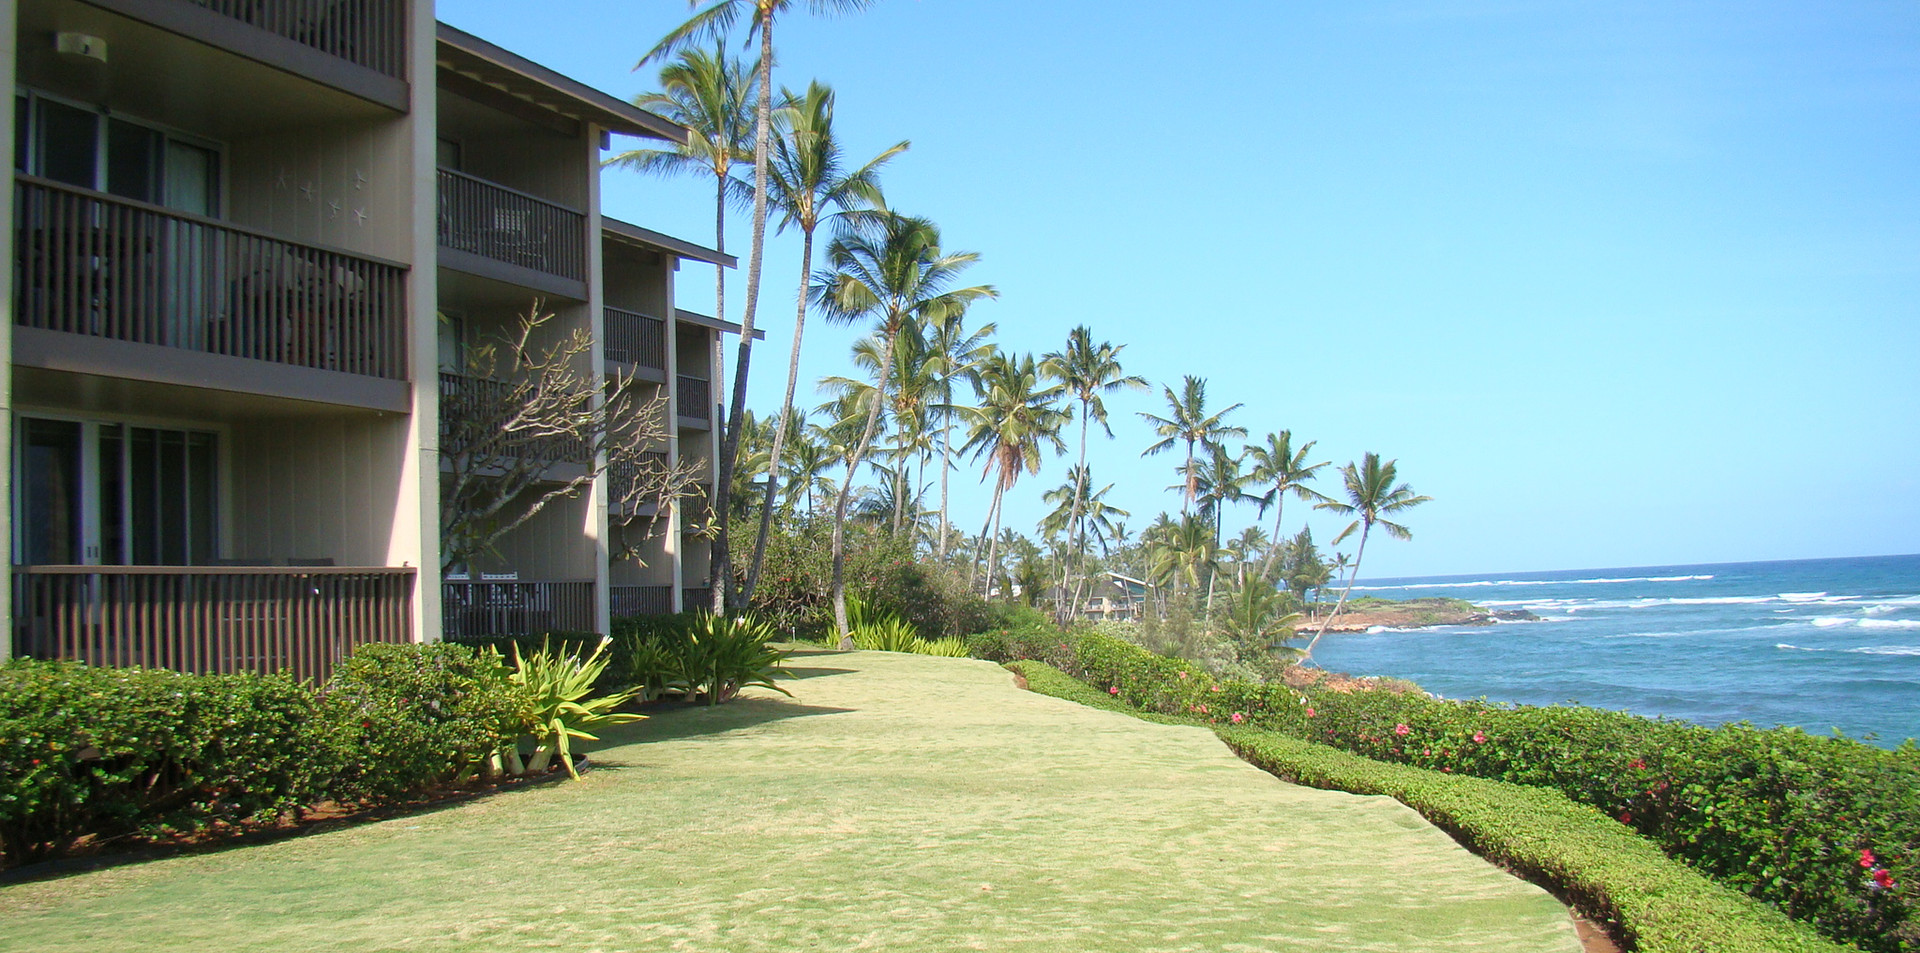 Oceanfront Back Lawn